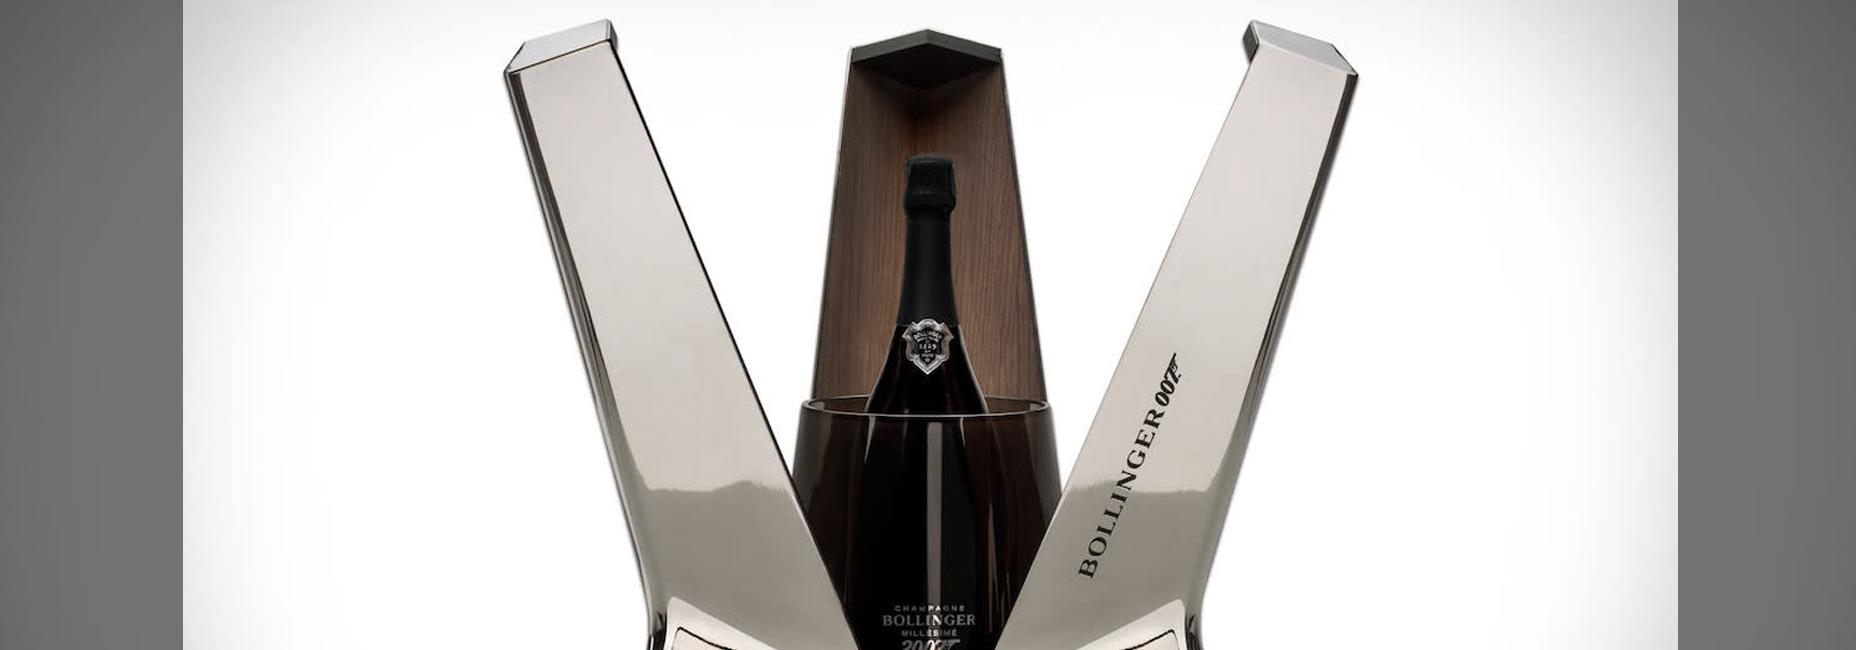 Bollinger 007, el champán que te hará sentir como James Bond